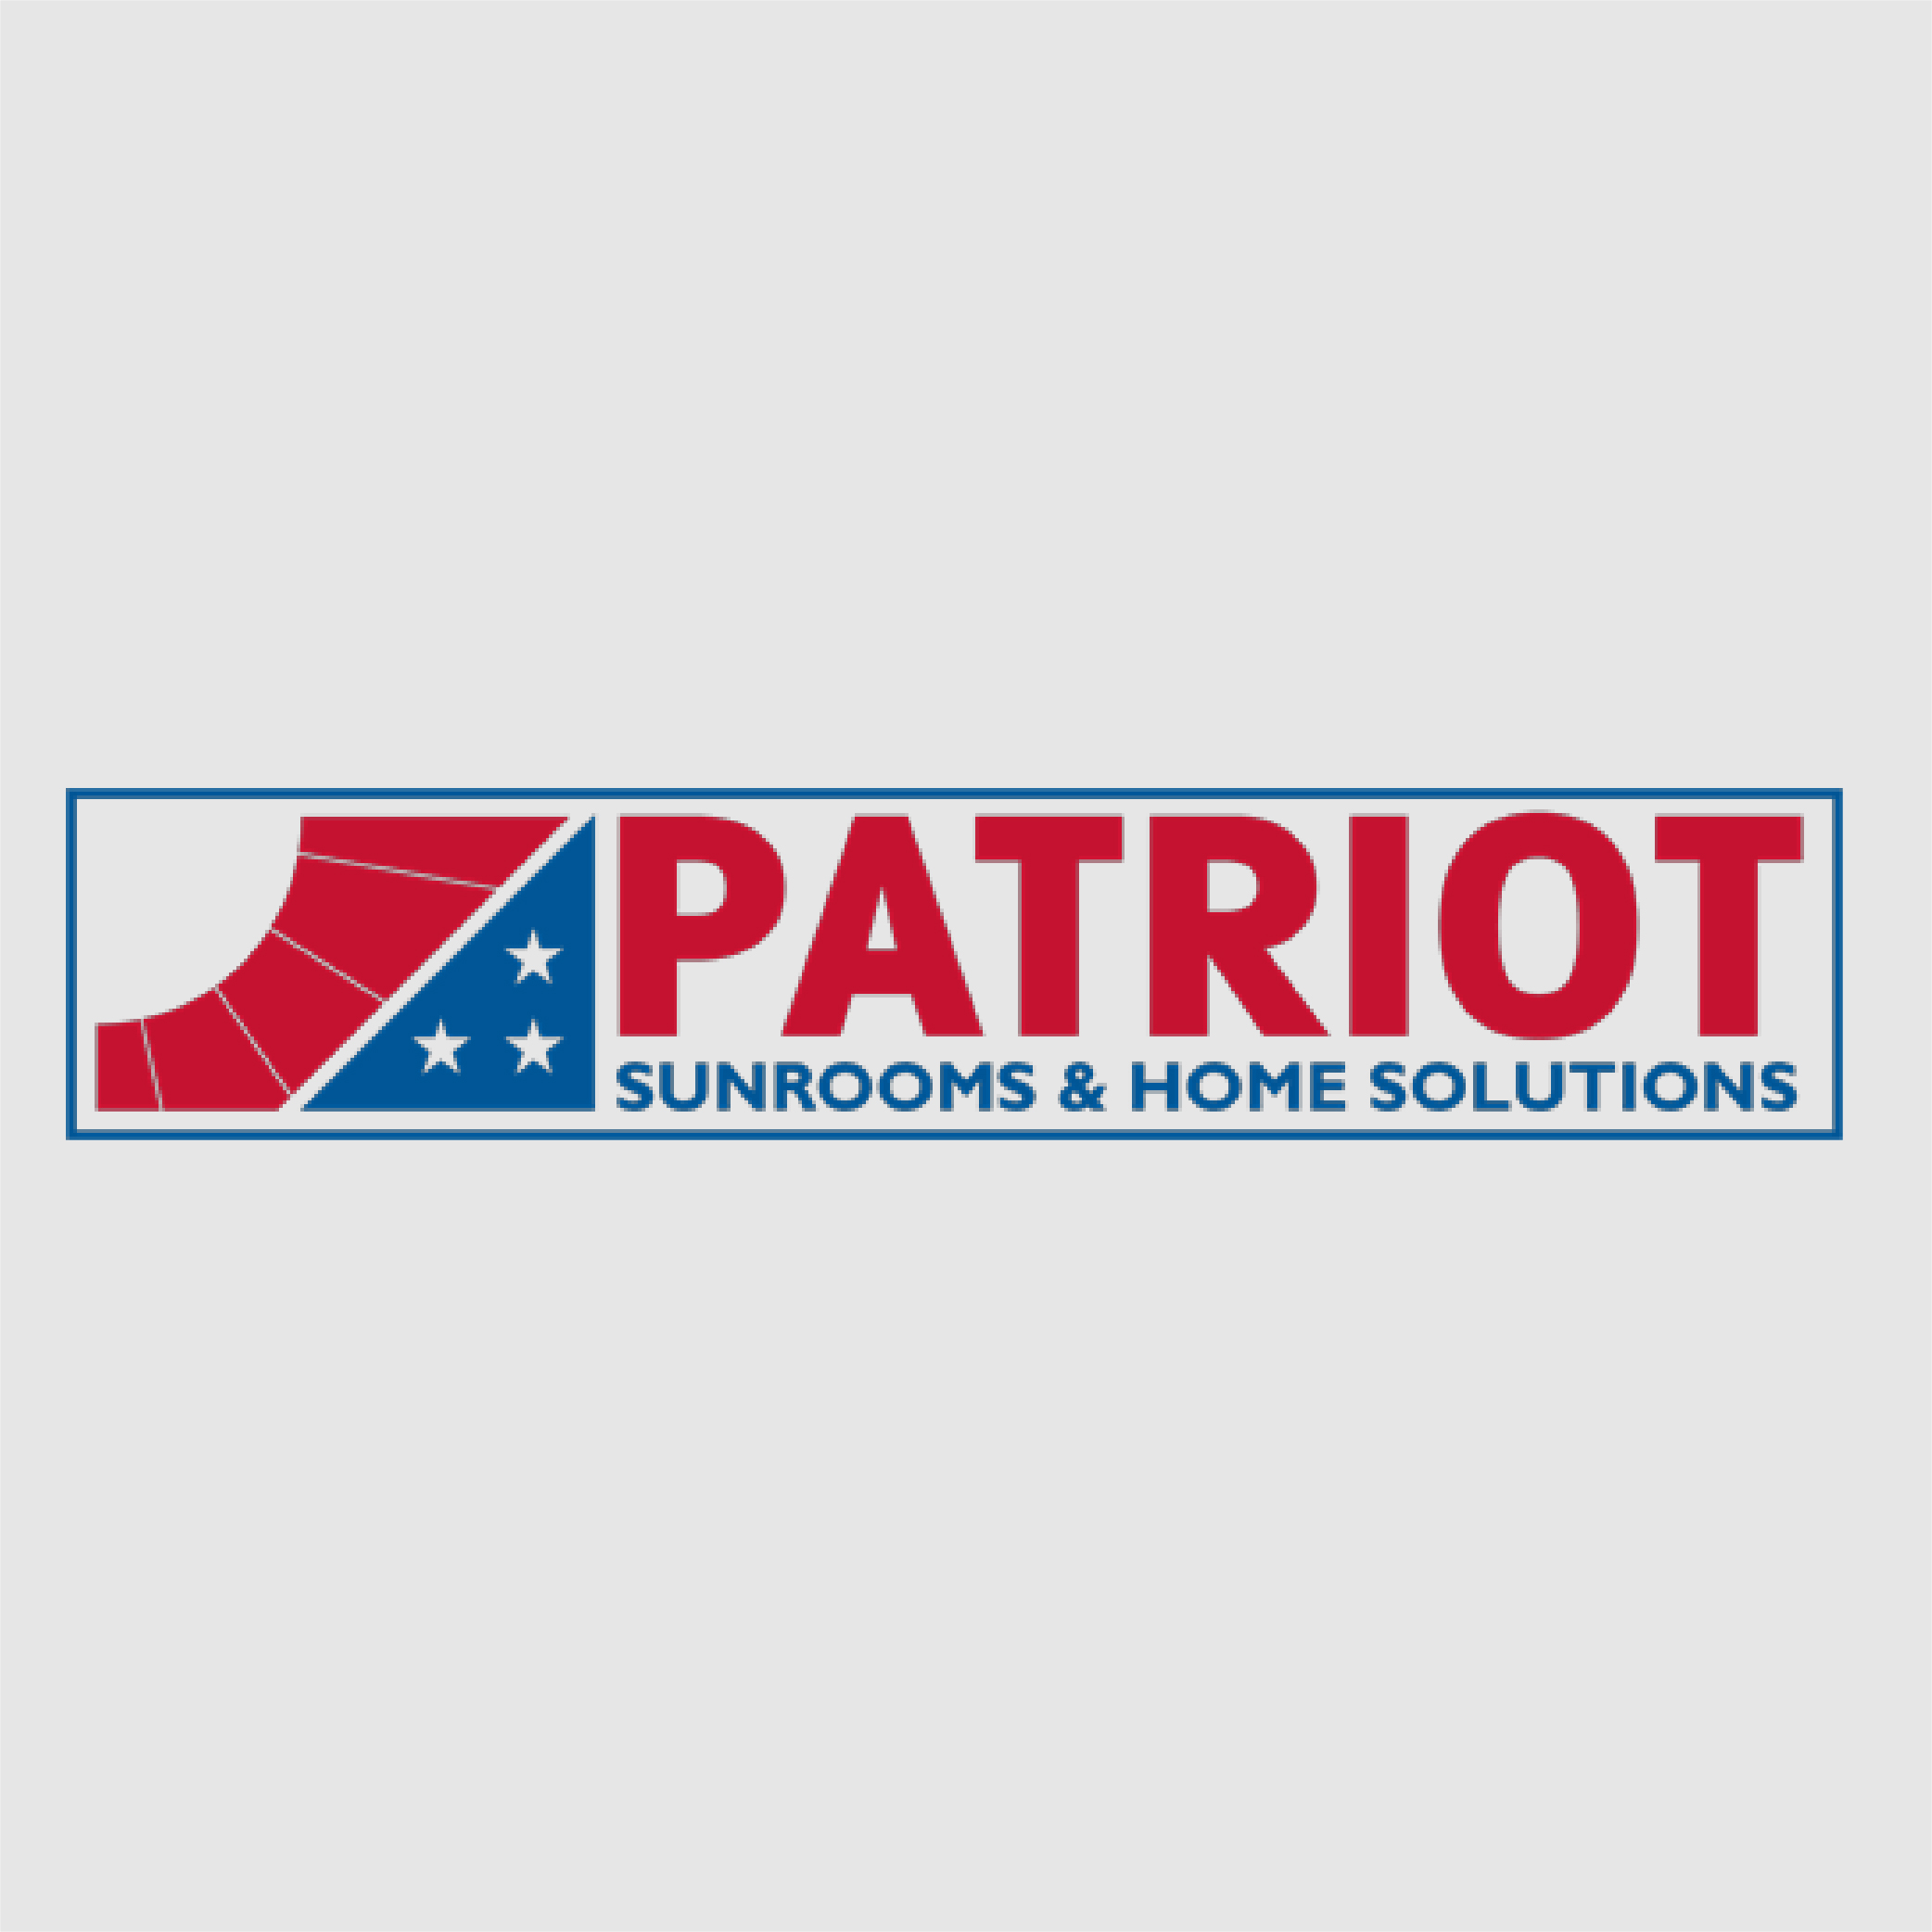 Patriot Sunrooms, Inc.    Matt Nyberg    811 S Kirkwood Road    St. Louis, MO 63122-6016    (314) 822-3232    Nyberg70@aol.com     http://www.patriotsunrooms.com     Member Since: 2010